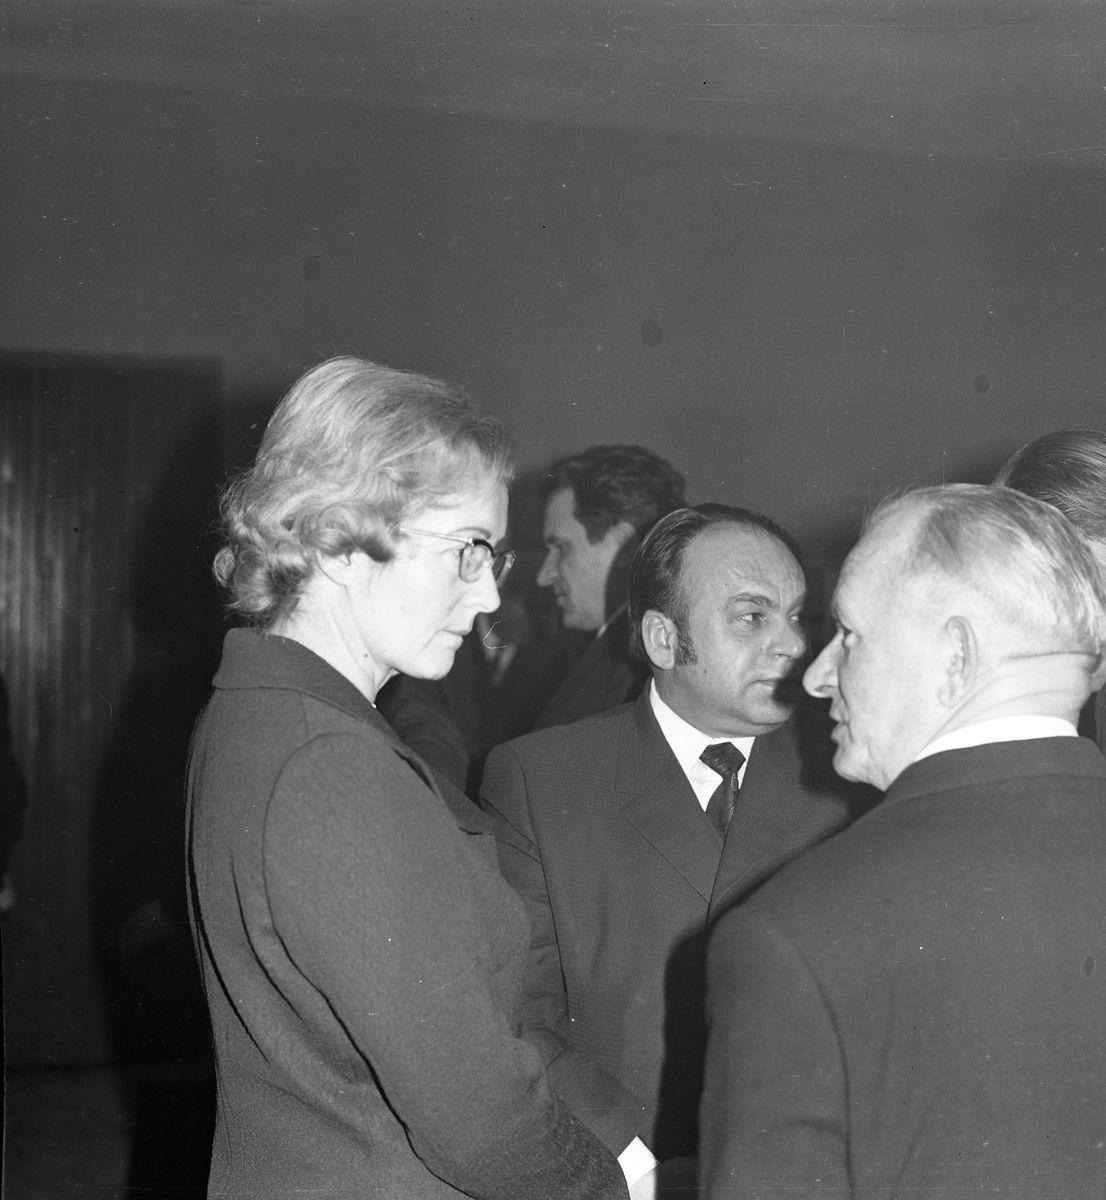 Spotkanie partyjne, 1974 r. [4]